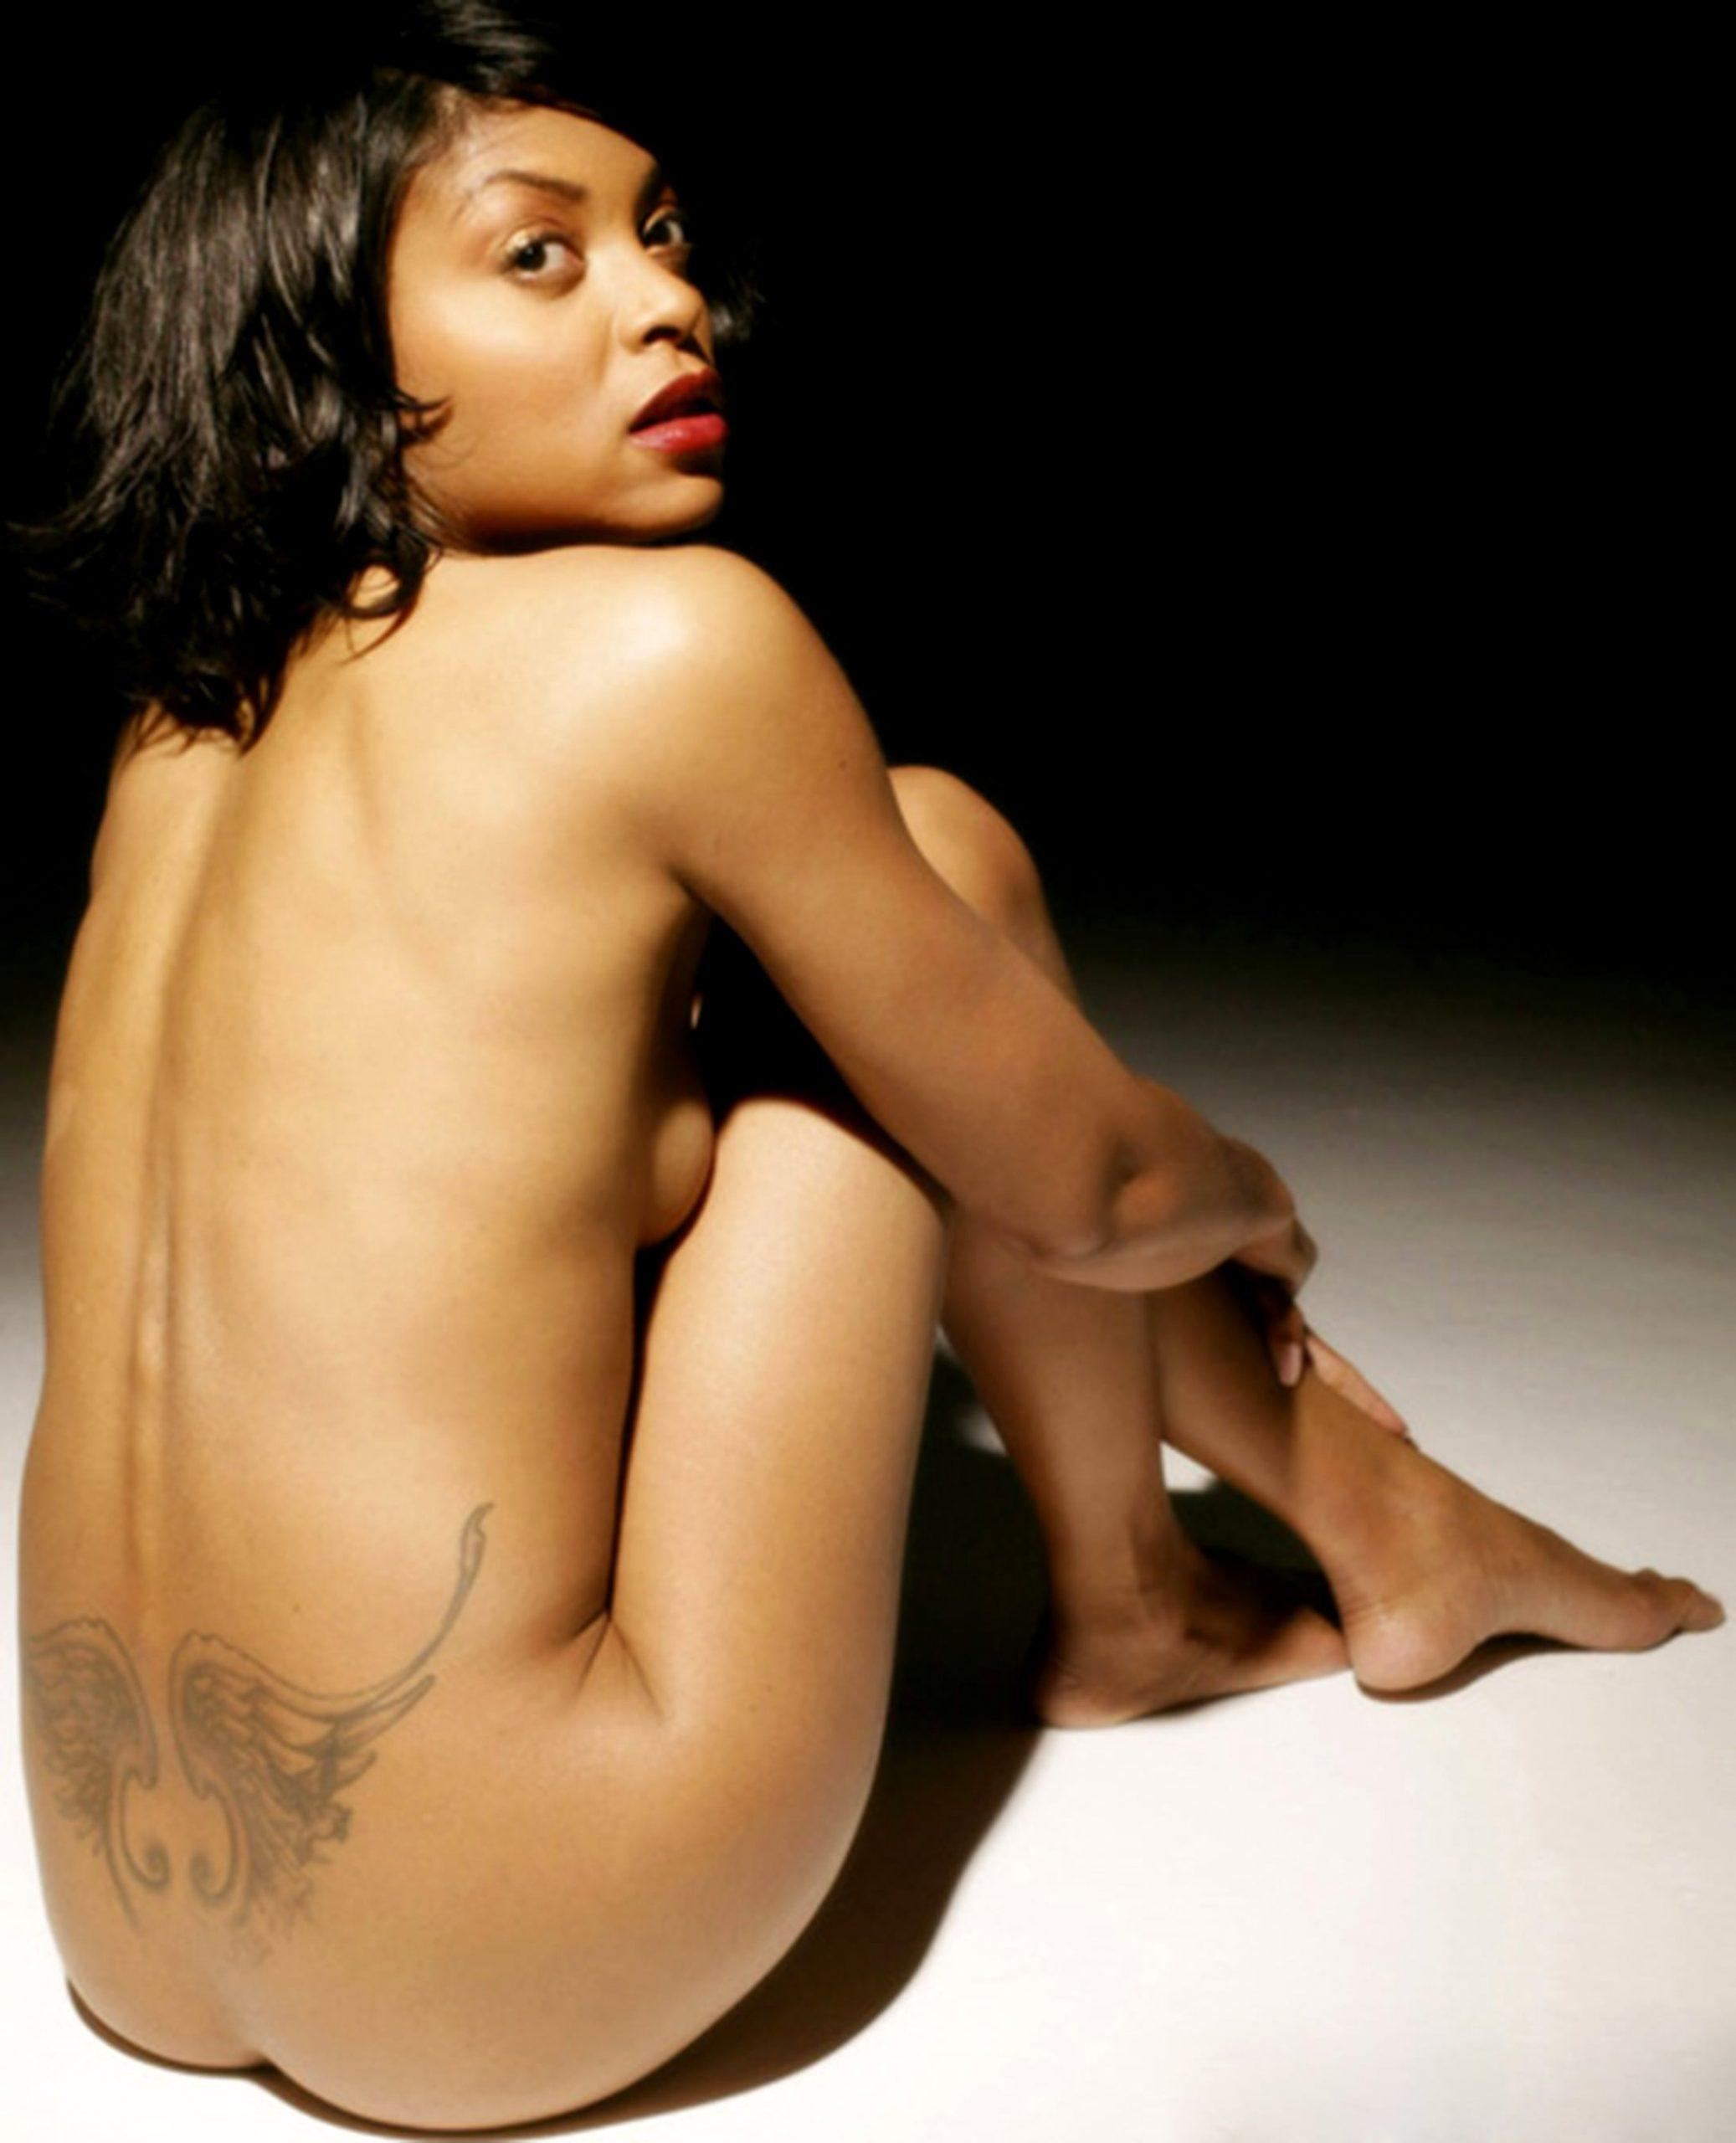 Taraji P. Henson nude pics